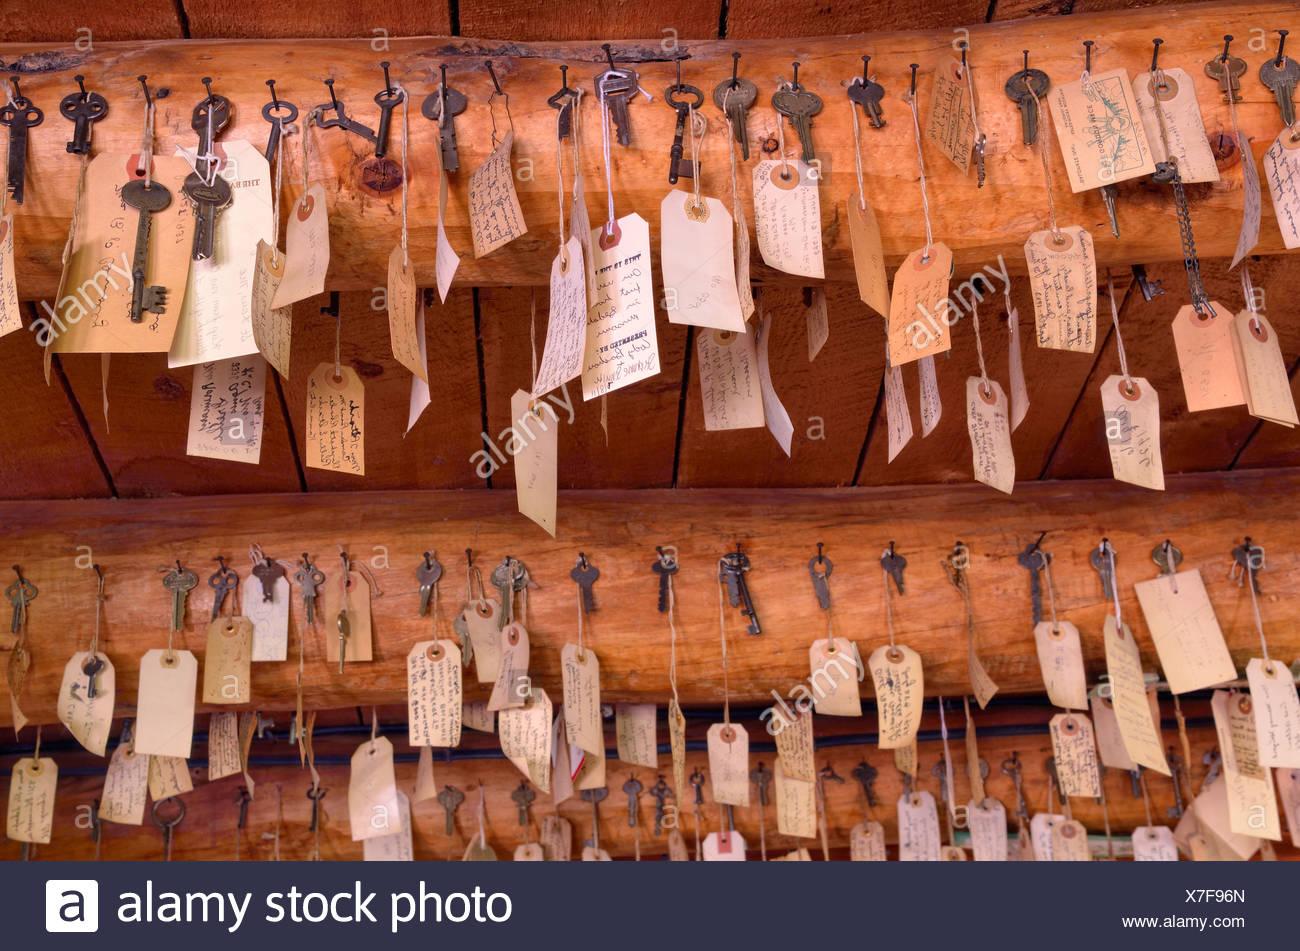 Collection of keys, The Baldpate Inn, Estes Park, Colorado, USA - Stock Image